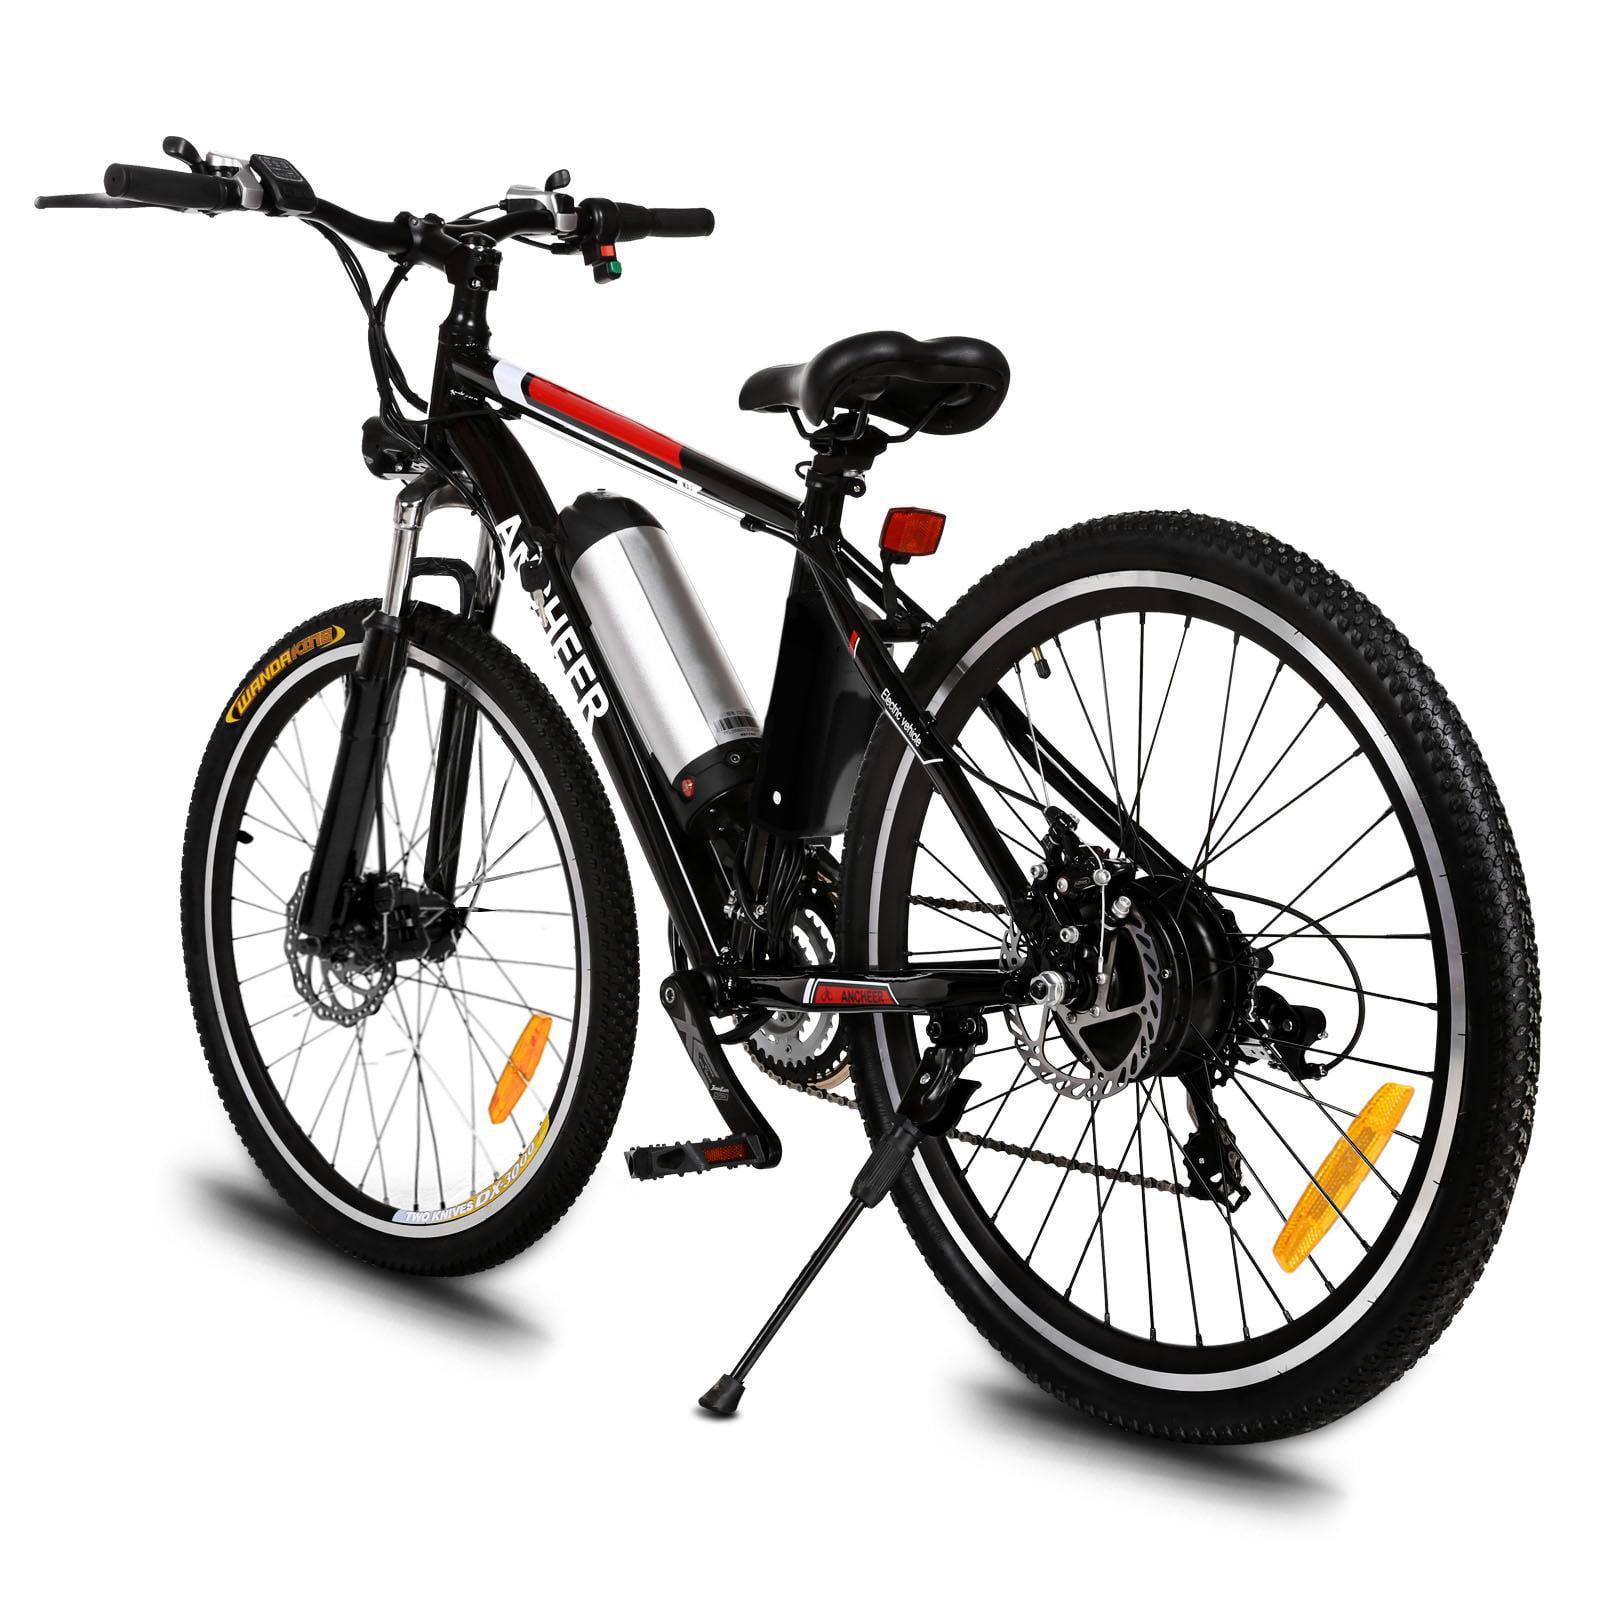 "25"" Electric Bike Men 21 Speed 250W Power Plus Mountain Bike Cycling Bicycle Aluminum Alloy Frame Bike AMZSE"